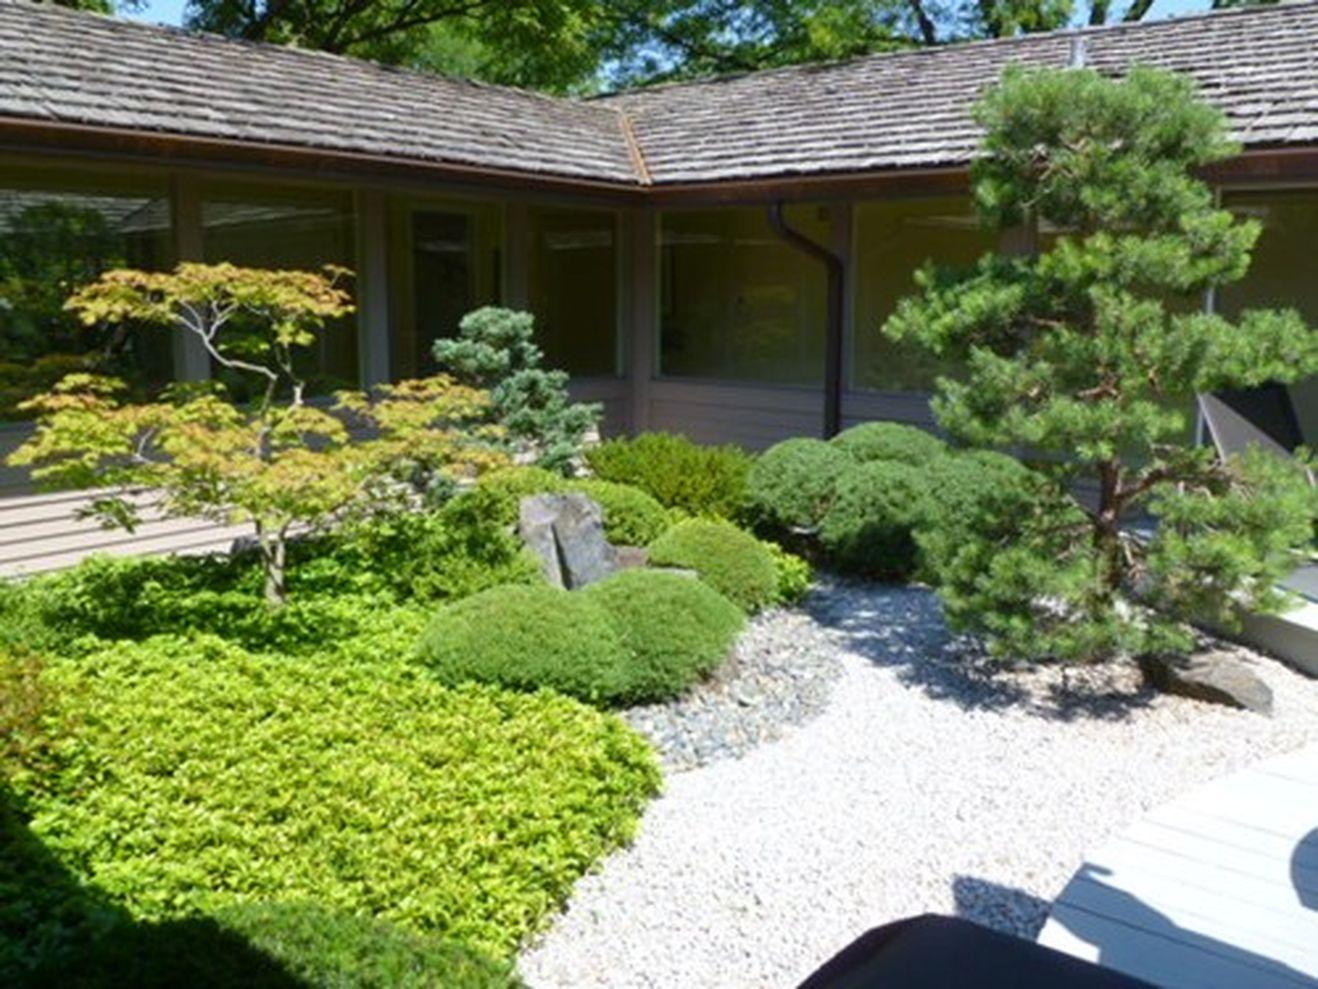 Beautiful modern japanese garden landscape ideas 02 ... on Backyard Japanese Garden Design Ideas id=38925